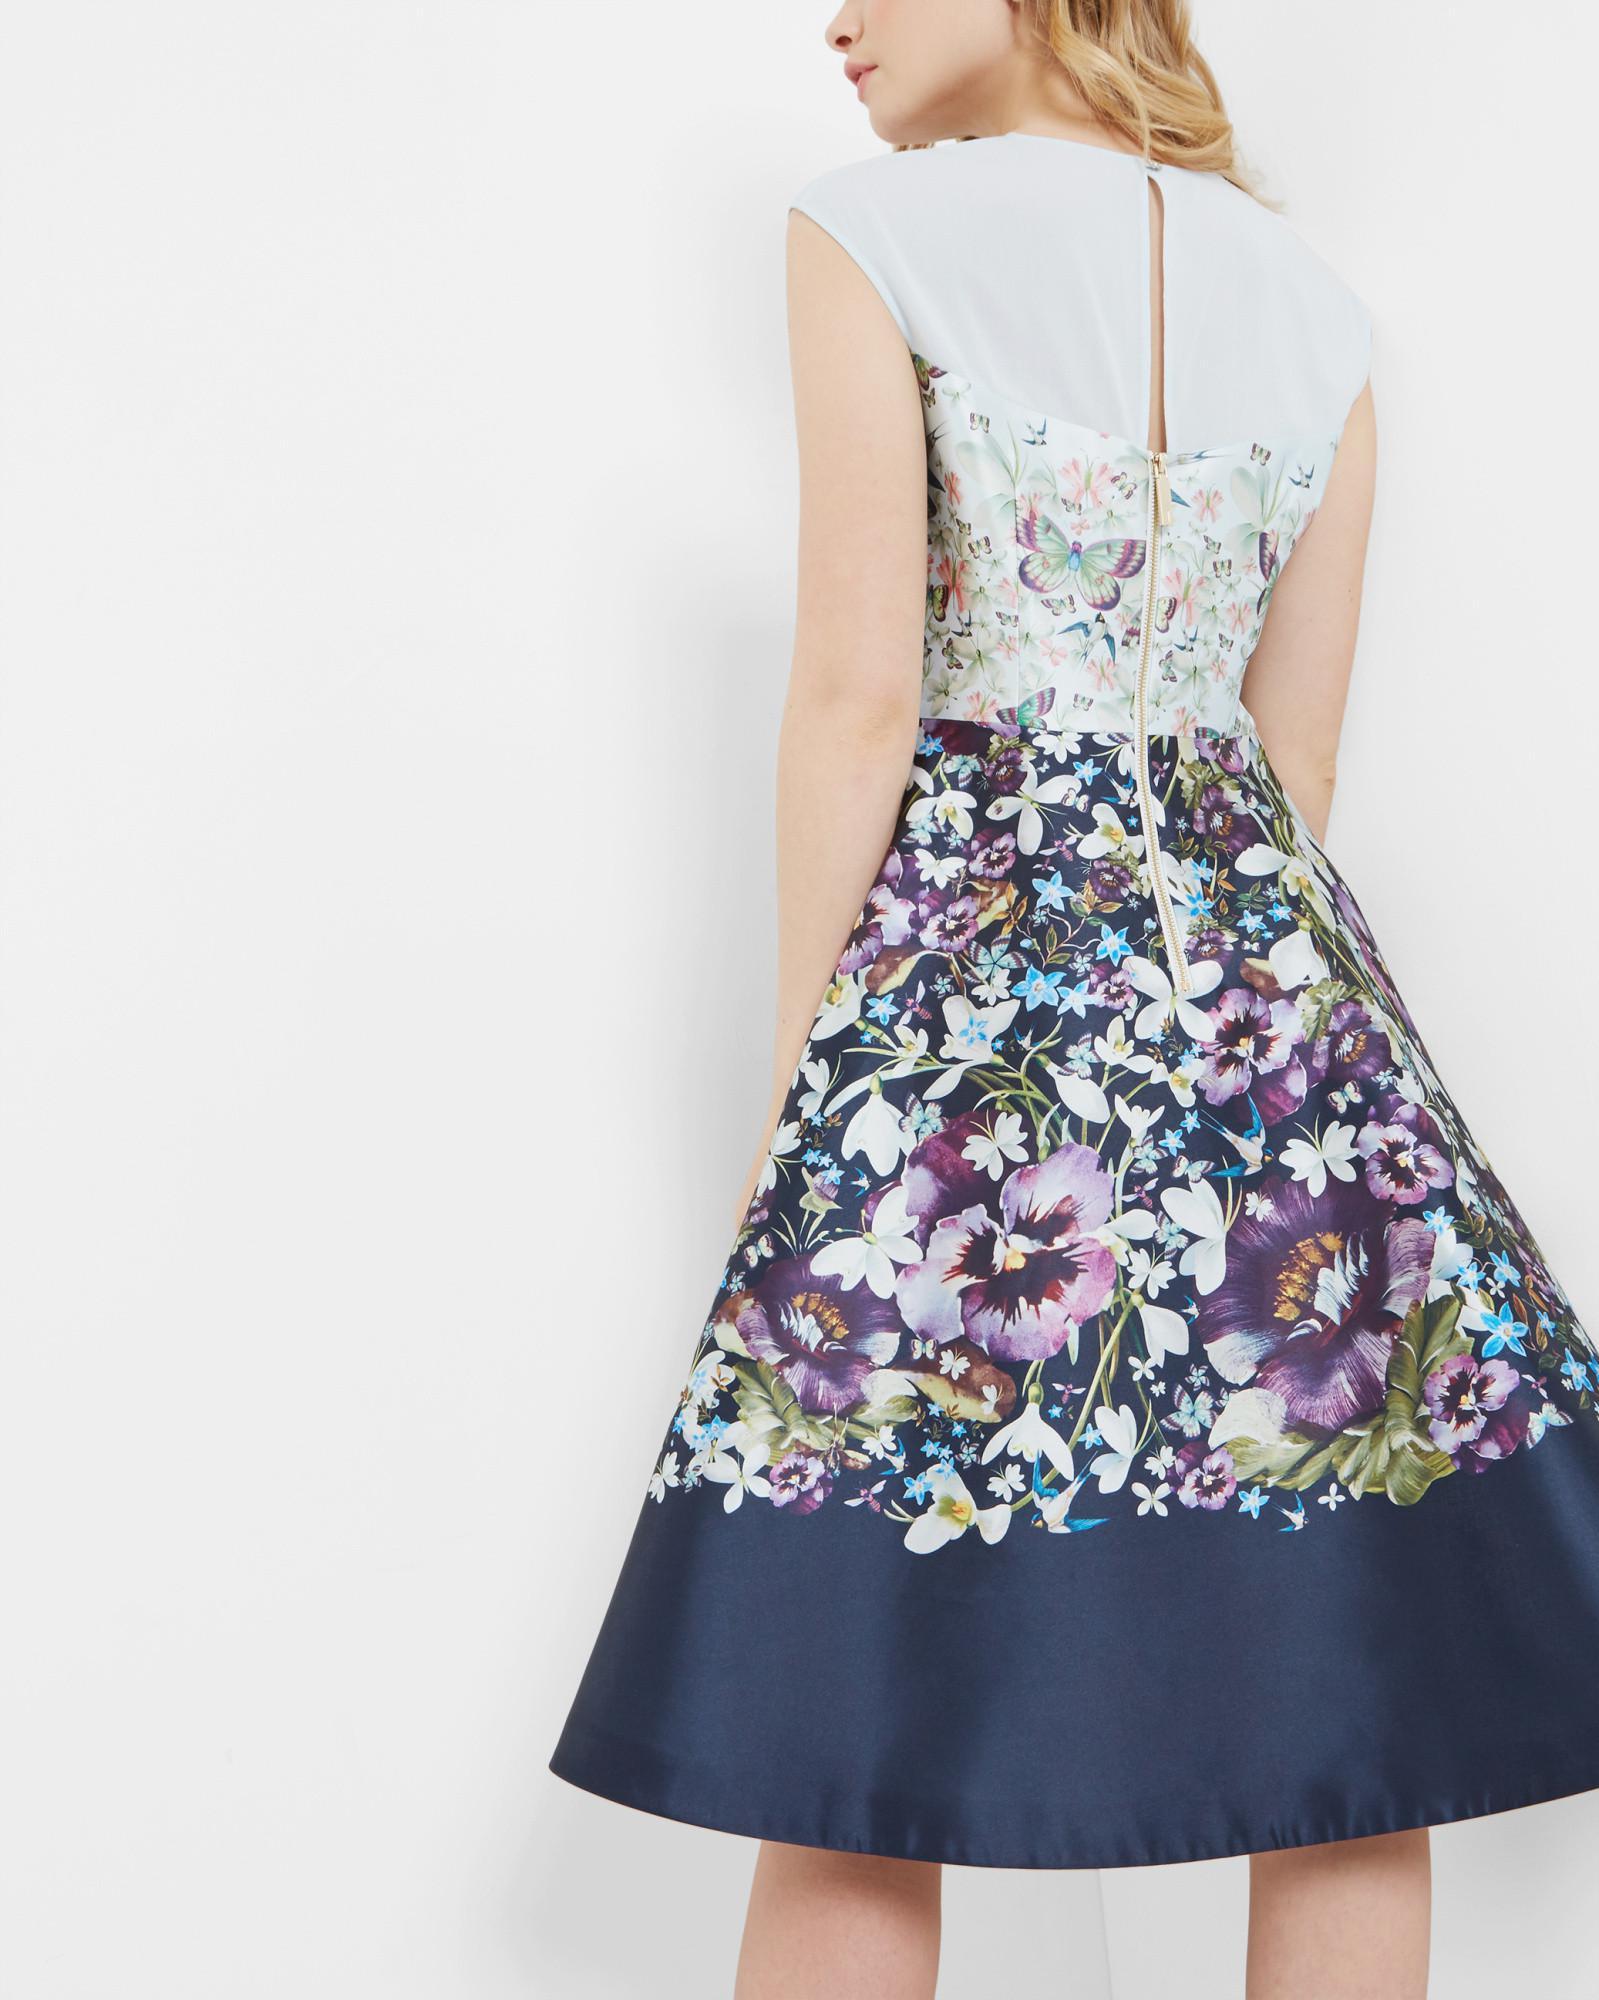 9926db221c178f Ted Baker Entangled Enchantment Midi Mesh Dress in Blue - Lyst